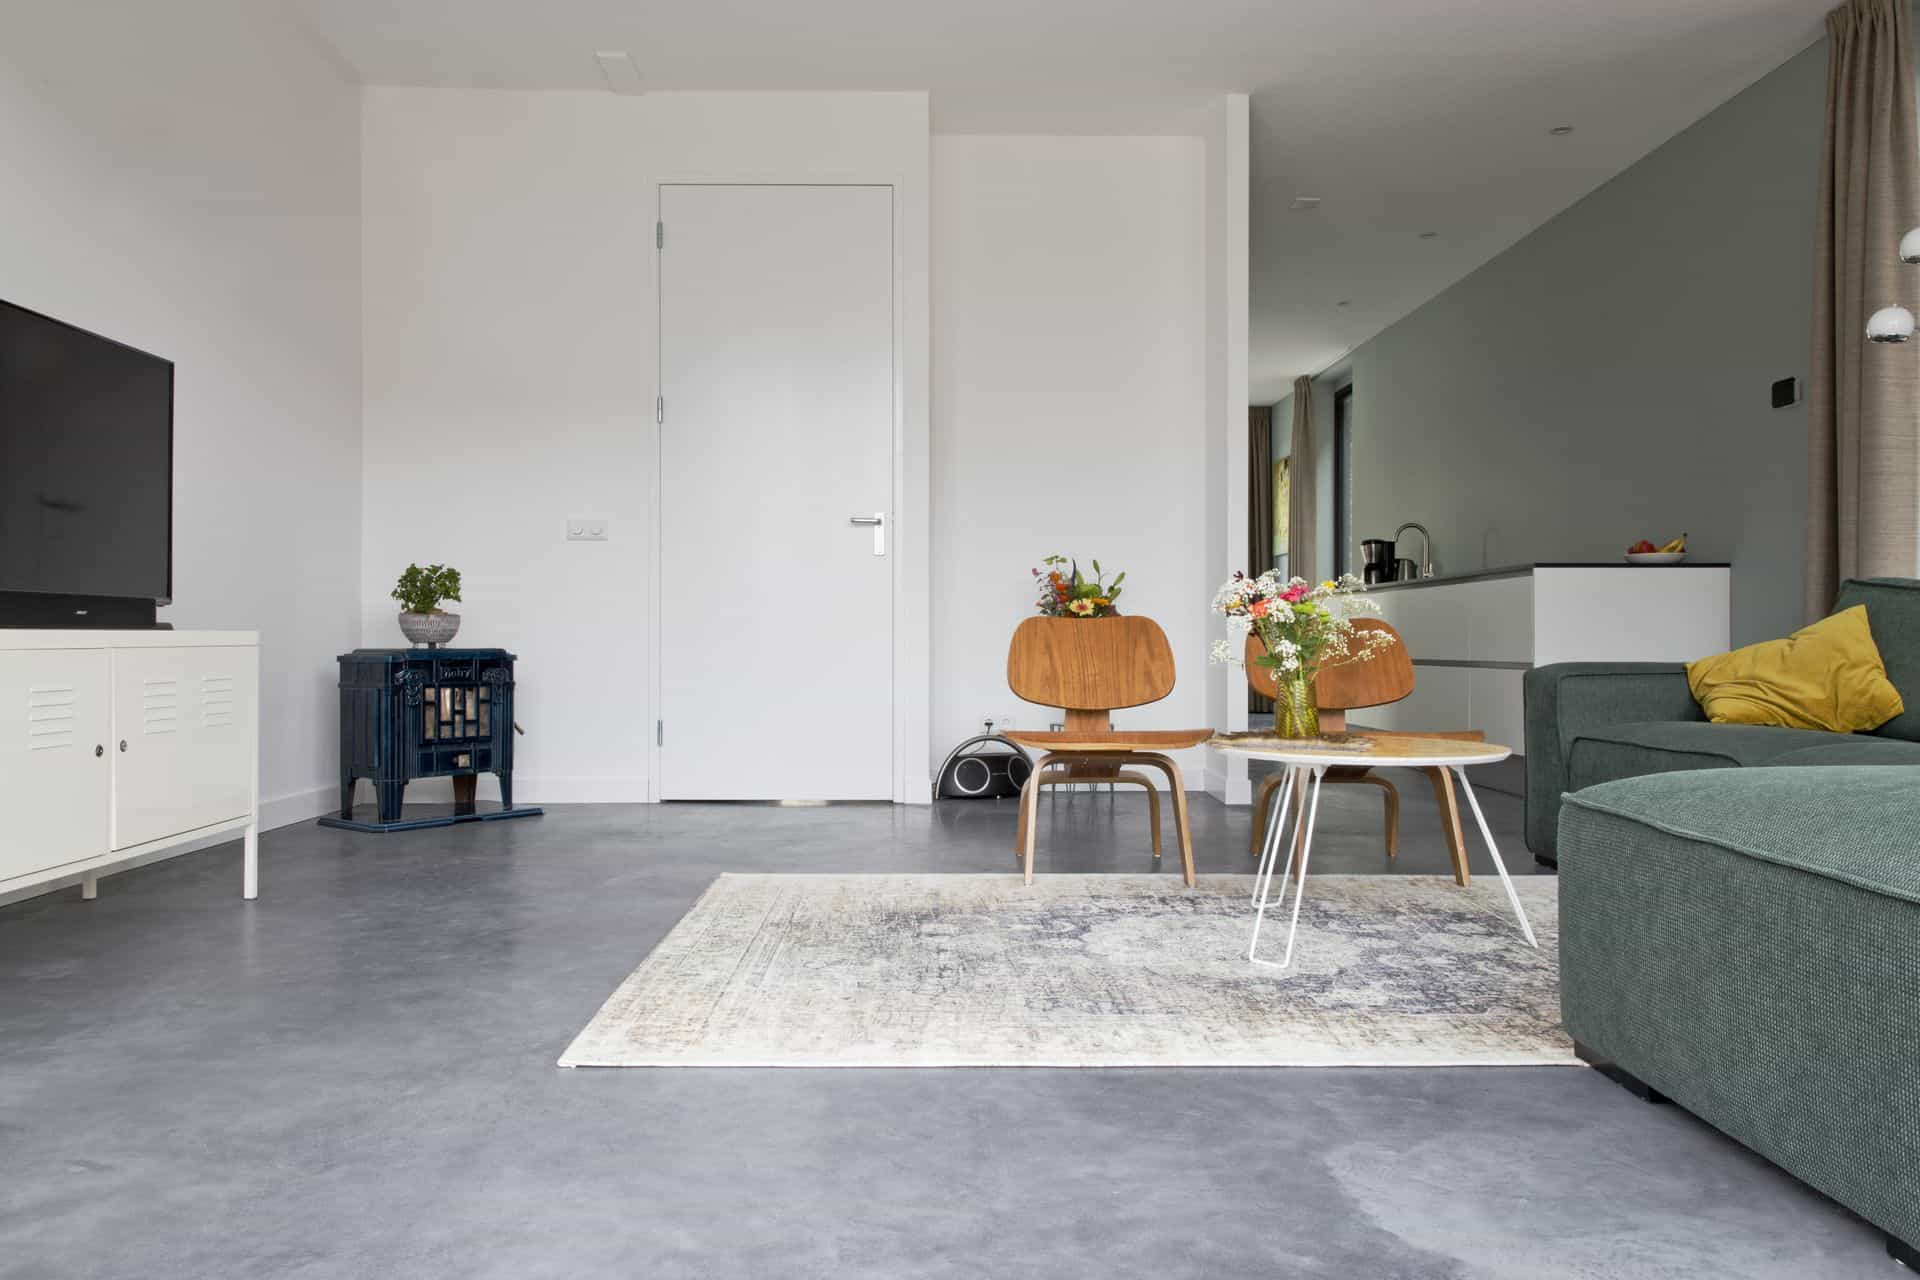 Betonvloer, betonvloer in uw woning, gevlinderde betonvloer